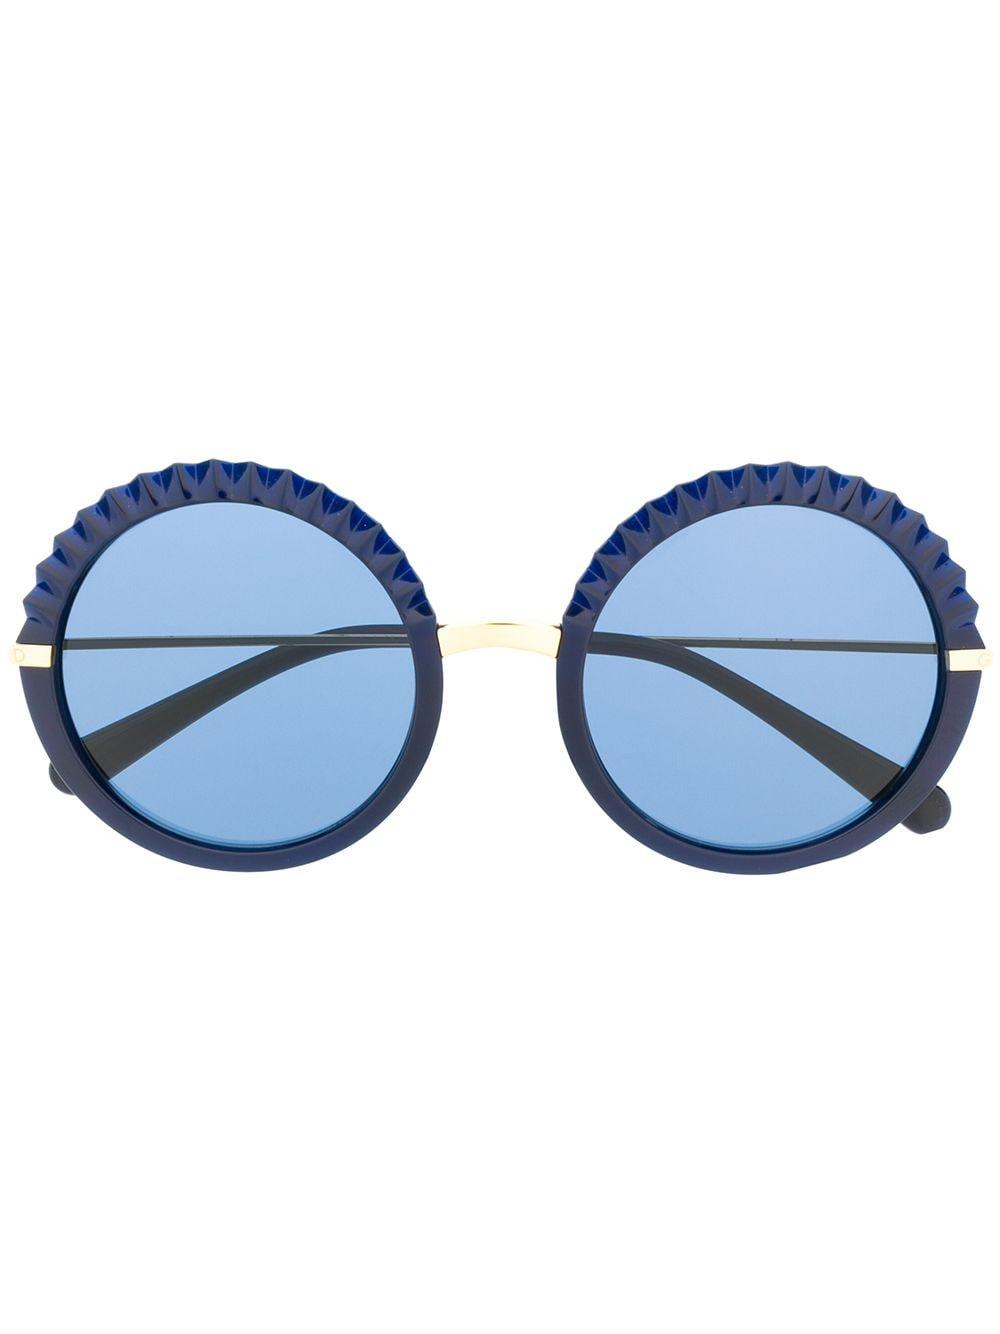 Dolce & Gabbana — Plissè sunglasses